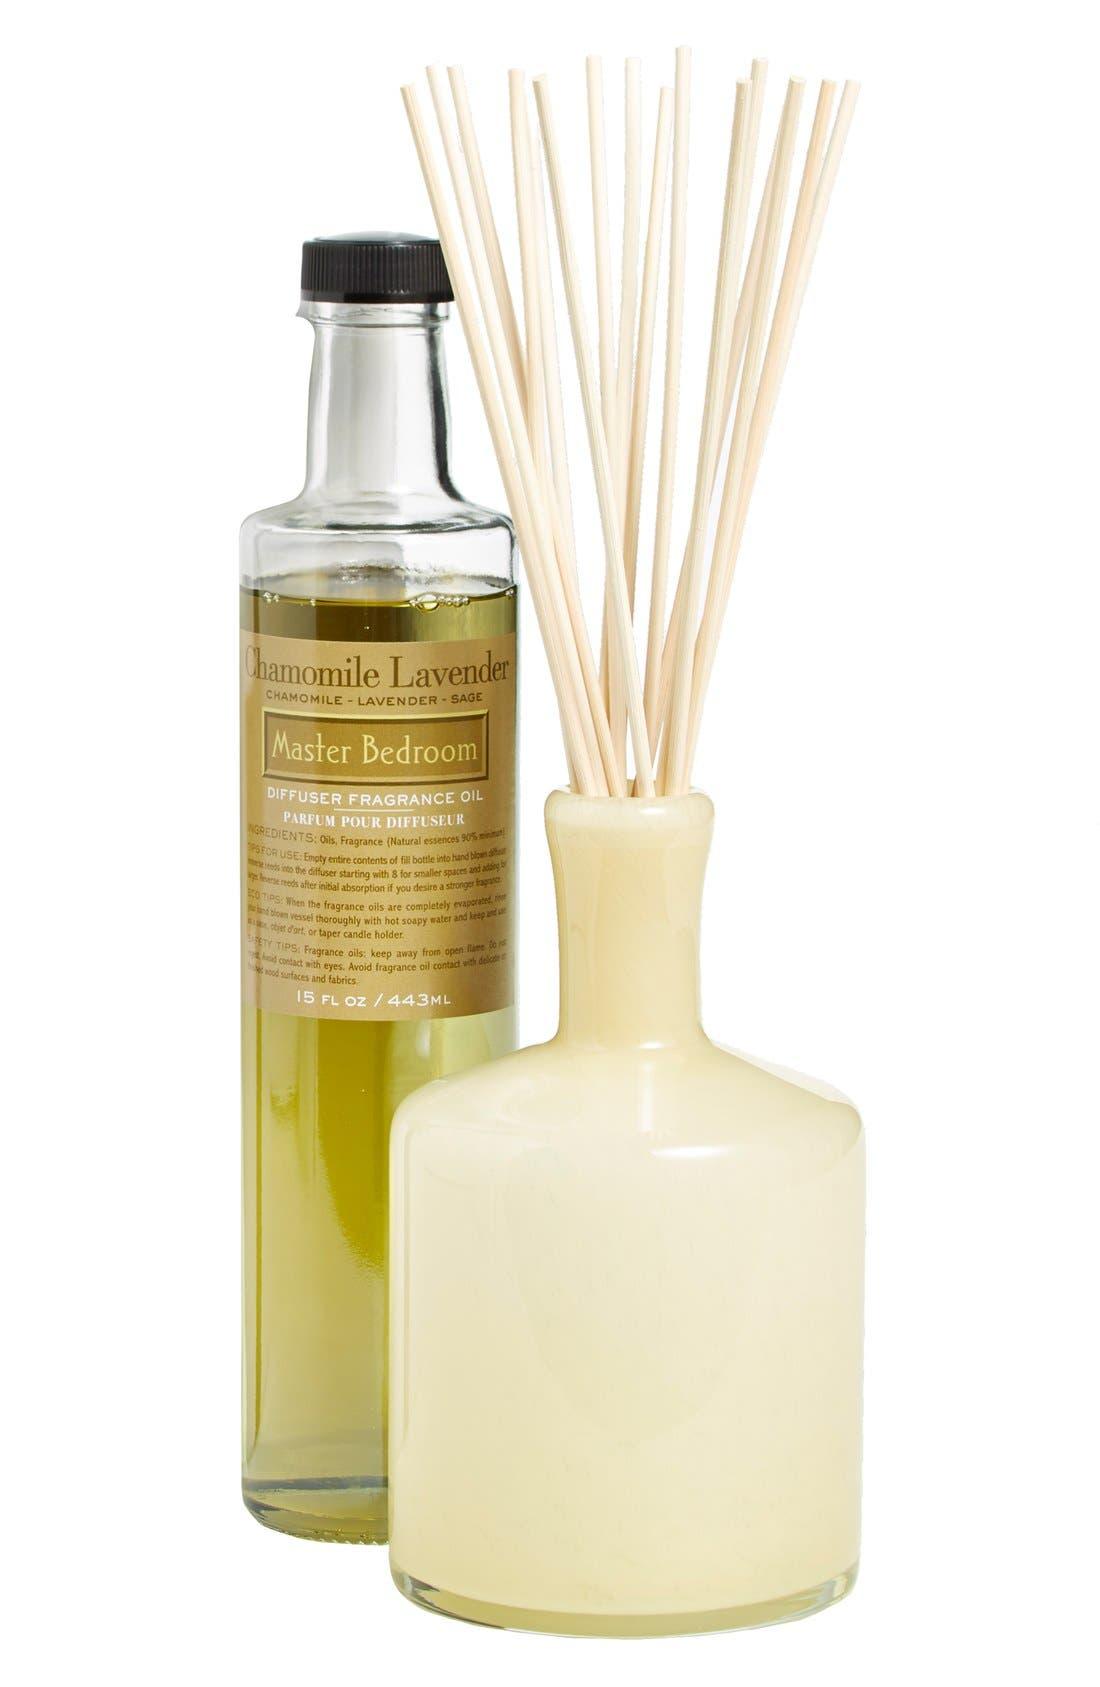 'Chamomile Lavender - Master Bedroom' Fragrance Diffuser,                         Main,                         color, No Color